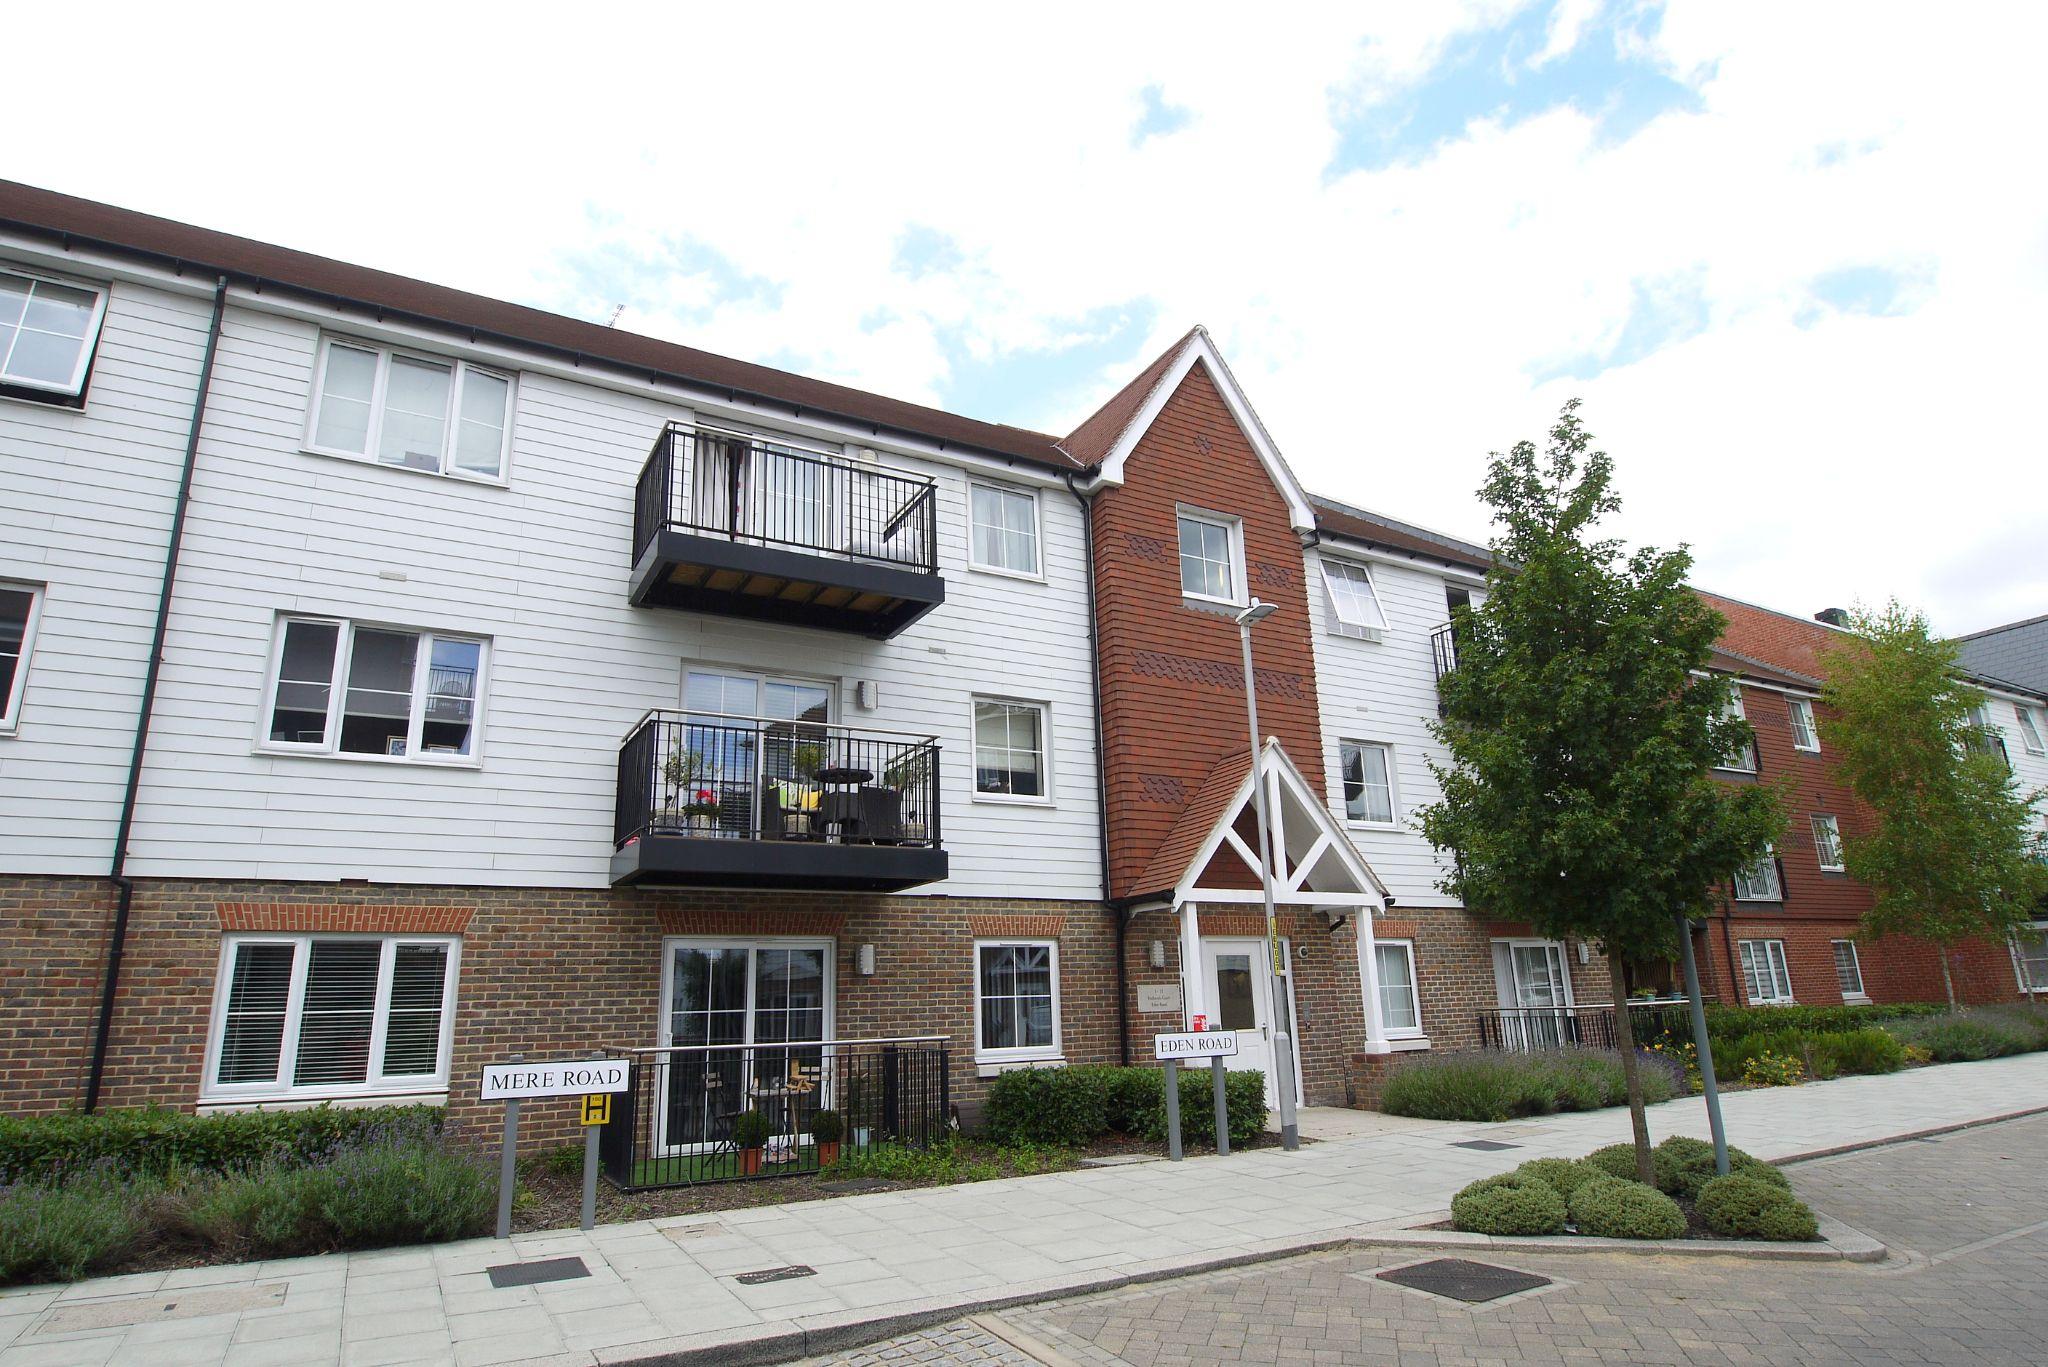 1 bedroom apartment flat/apartment For Sale in Sevenoaks - Photograph 10